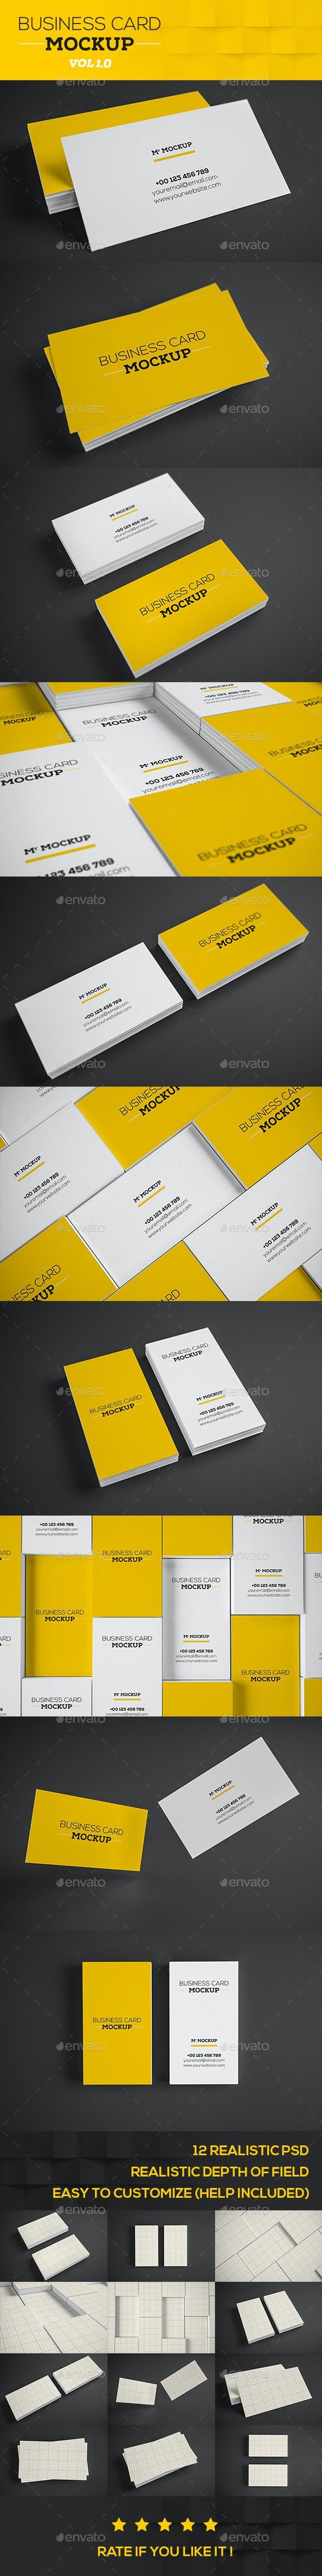 Realistic Business Card Mock-up V1 - Product Mock-Ups Graphics